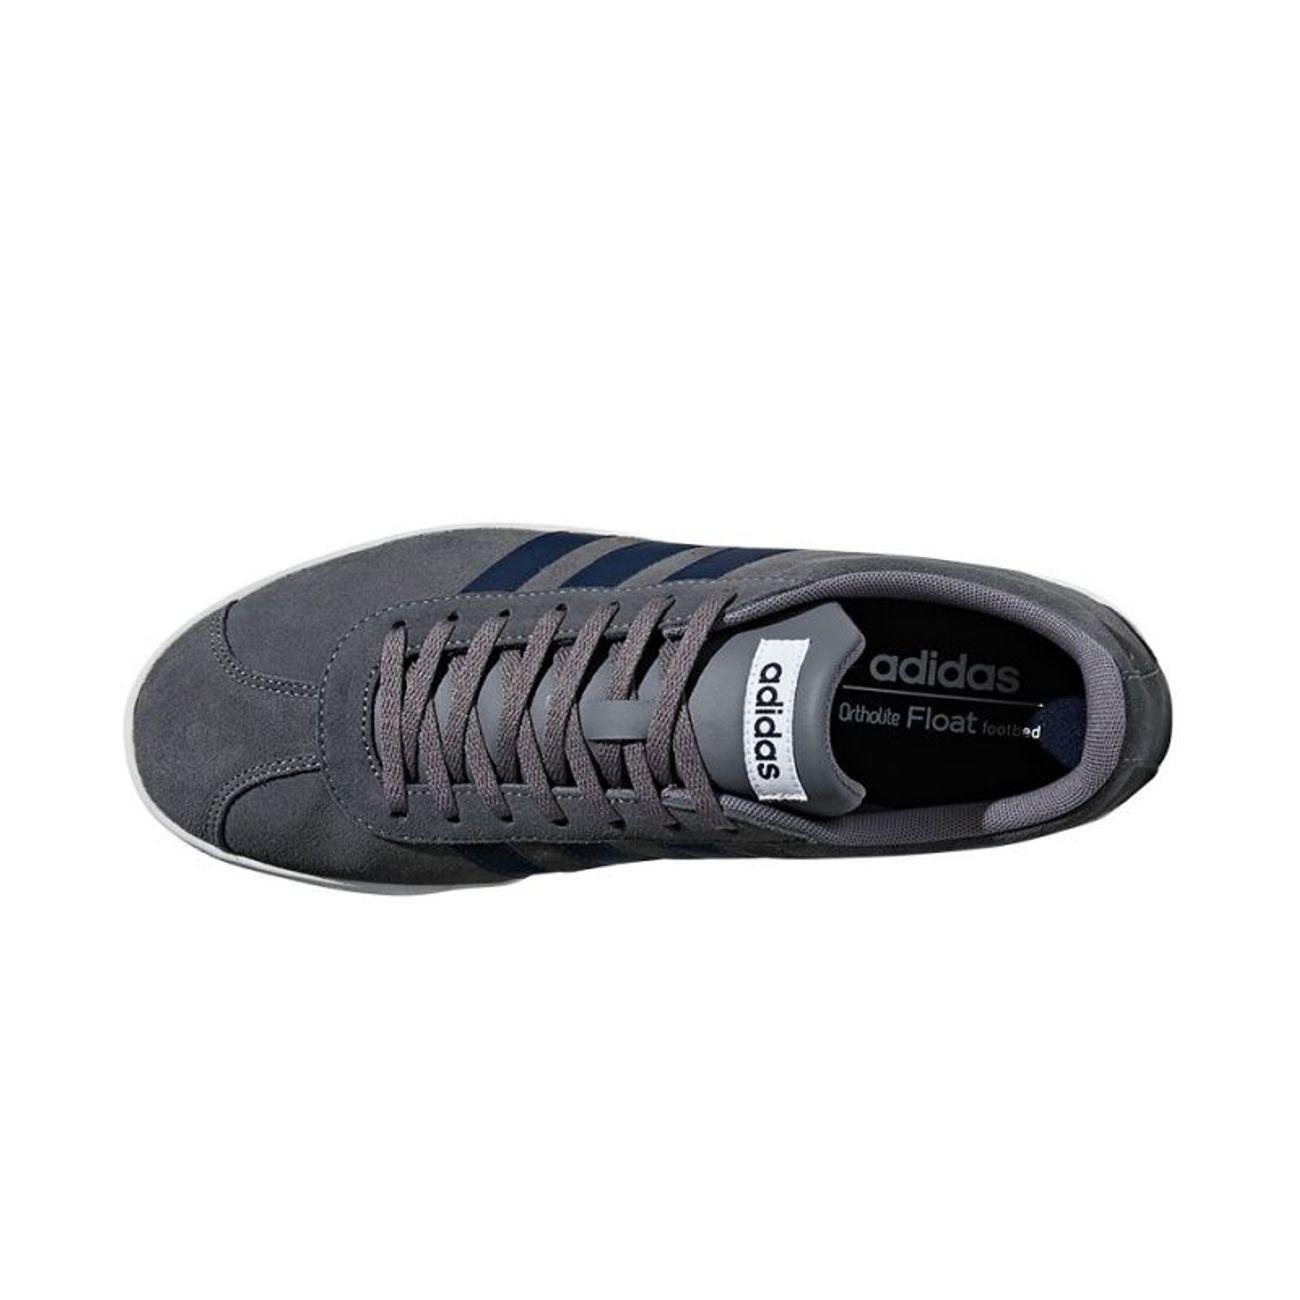 Adulte Adidas Gris Padel Neo Vl Court Da9862 0 2 eEDIYWH29b